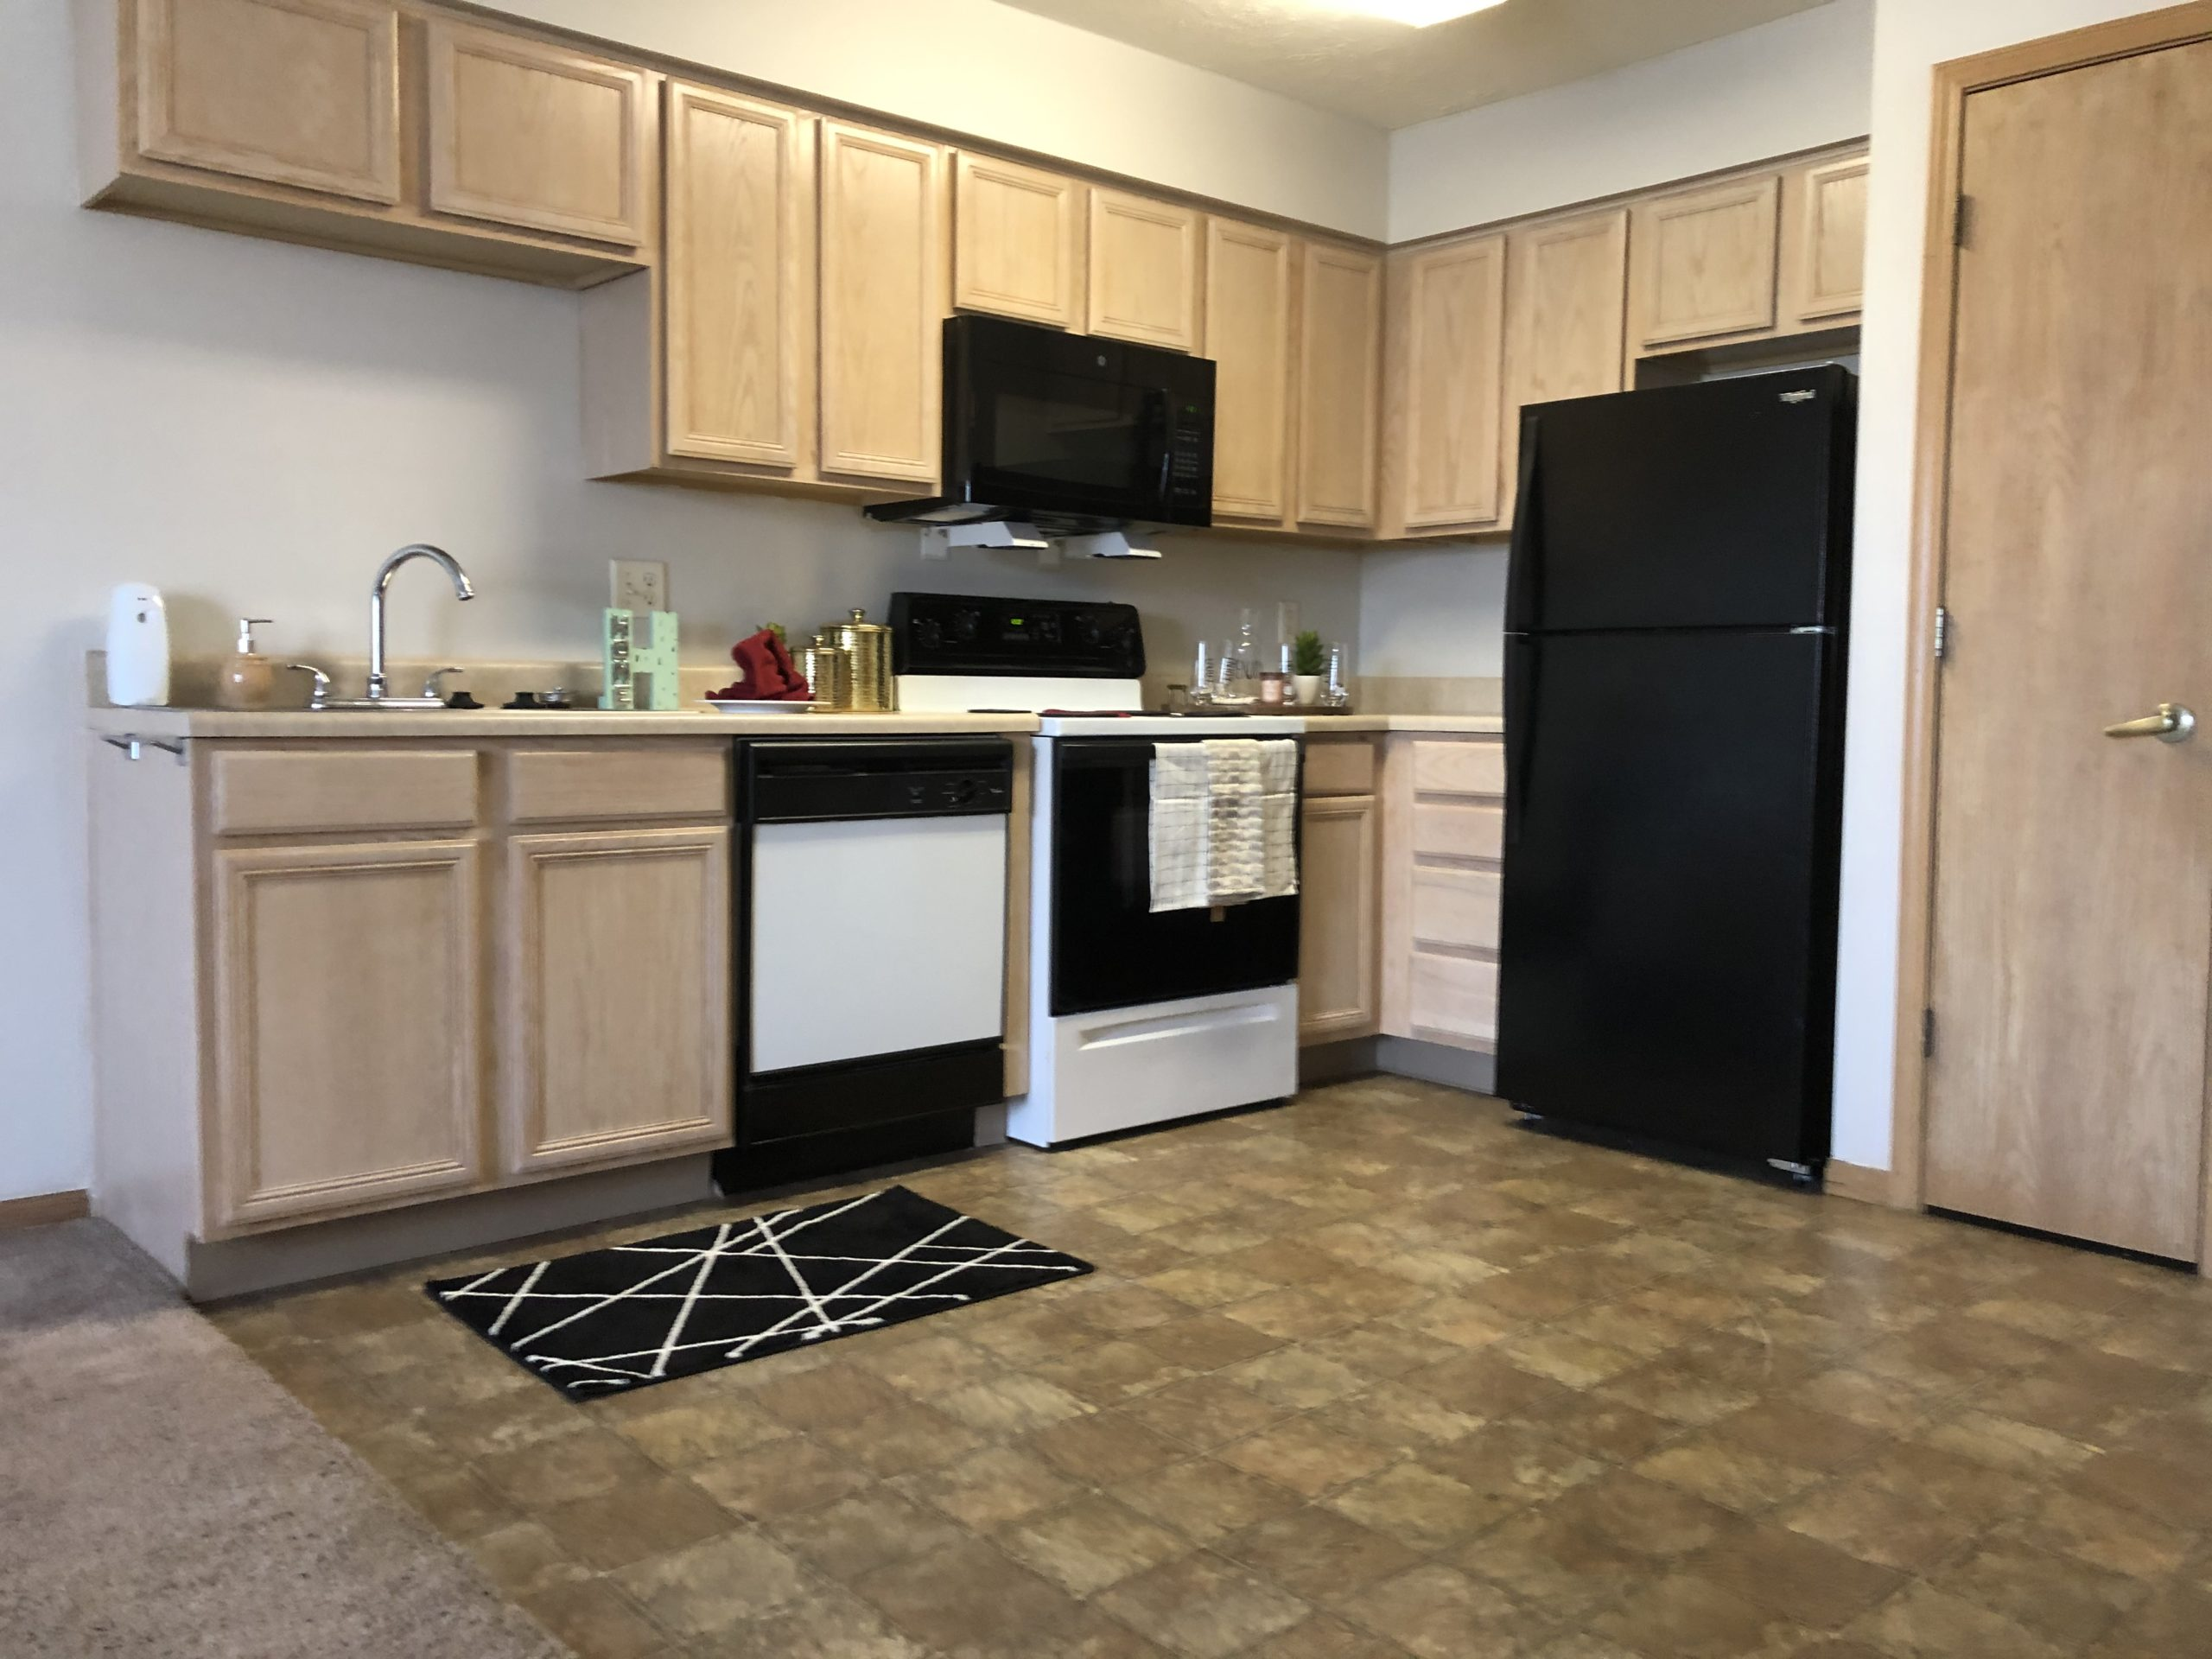 Tregaron Senior Residence Bellevue Nebraka kitchen